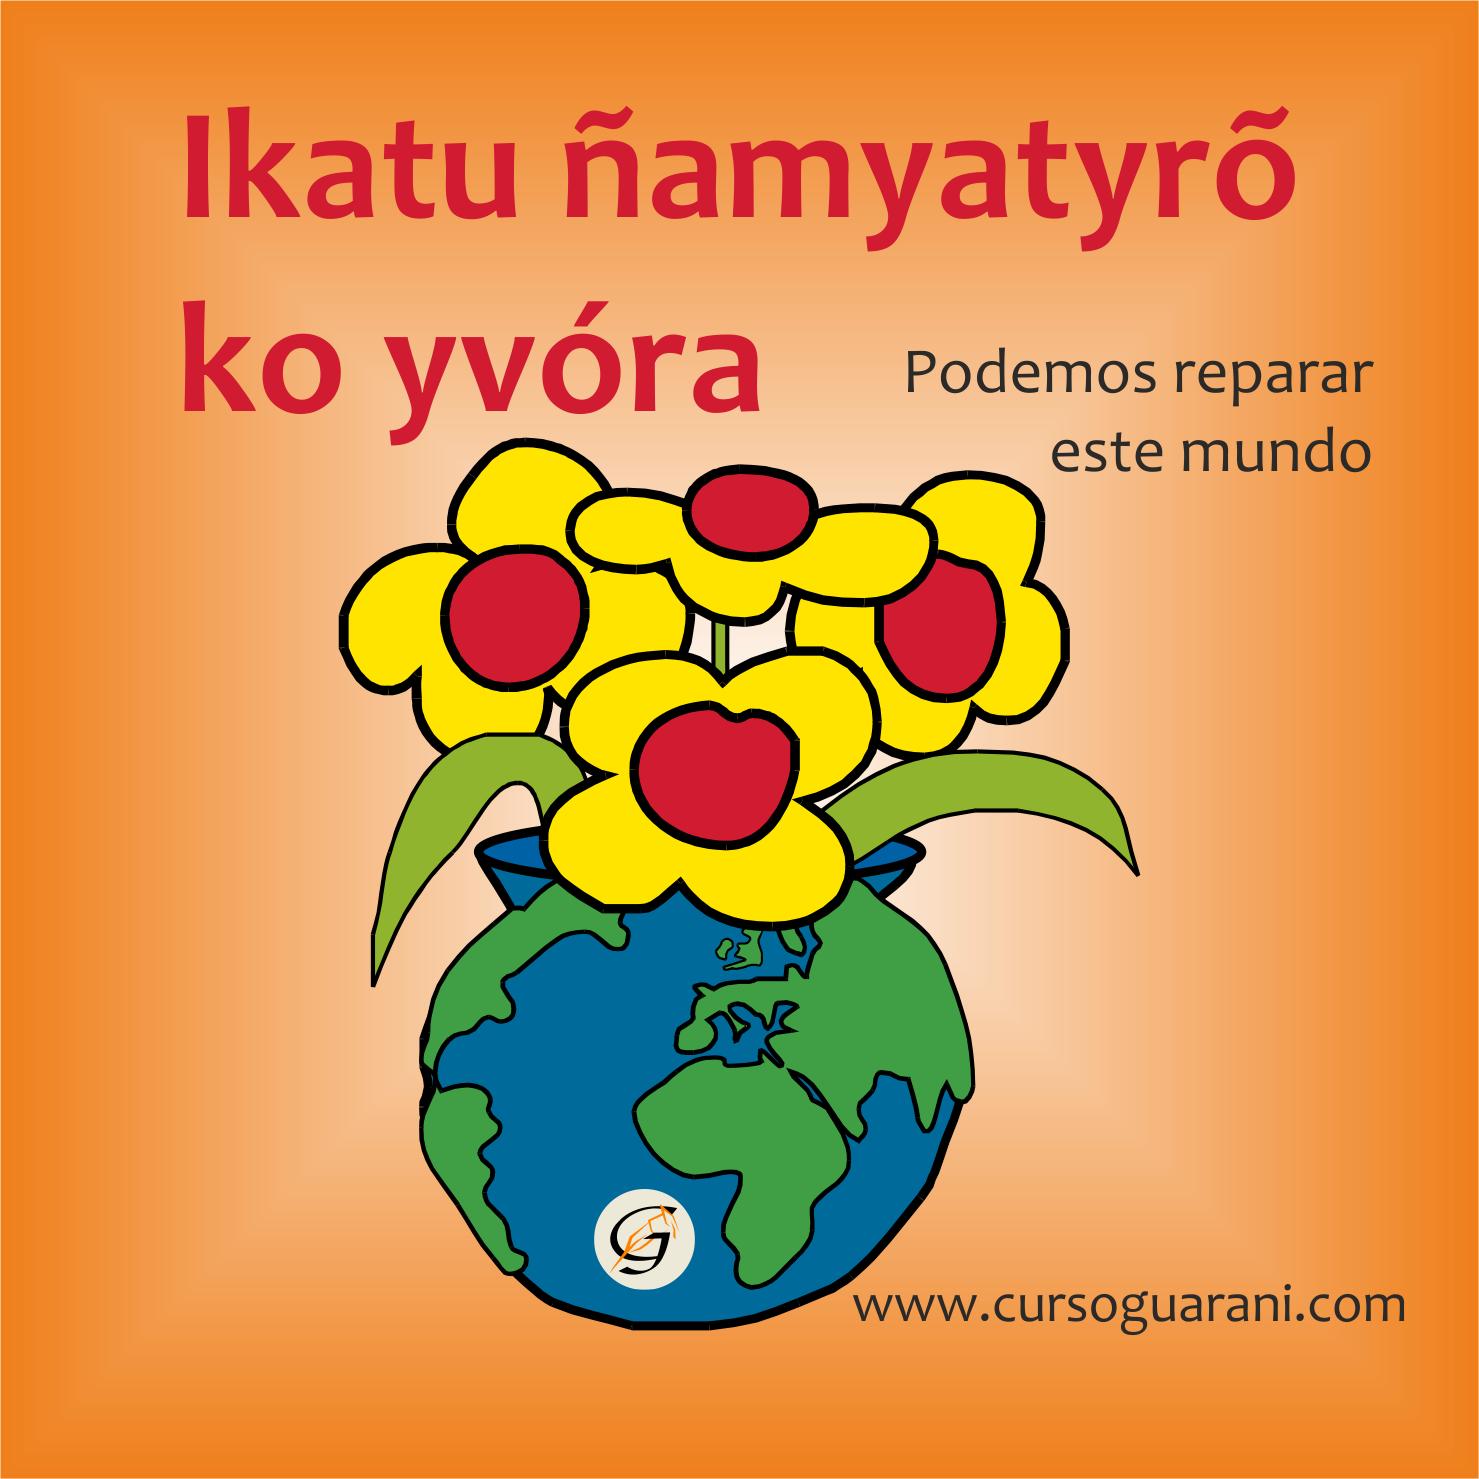 ikatu ñamyatyro ko yvora podemos reparar este mundo